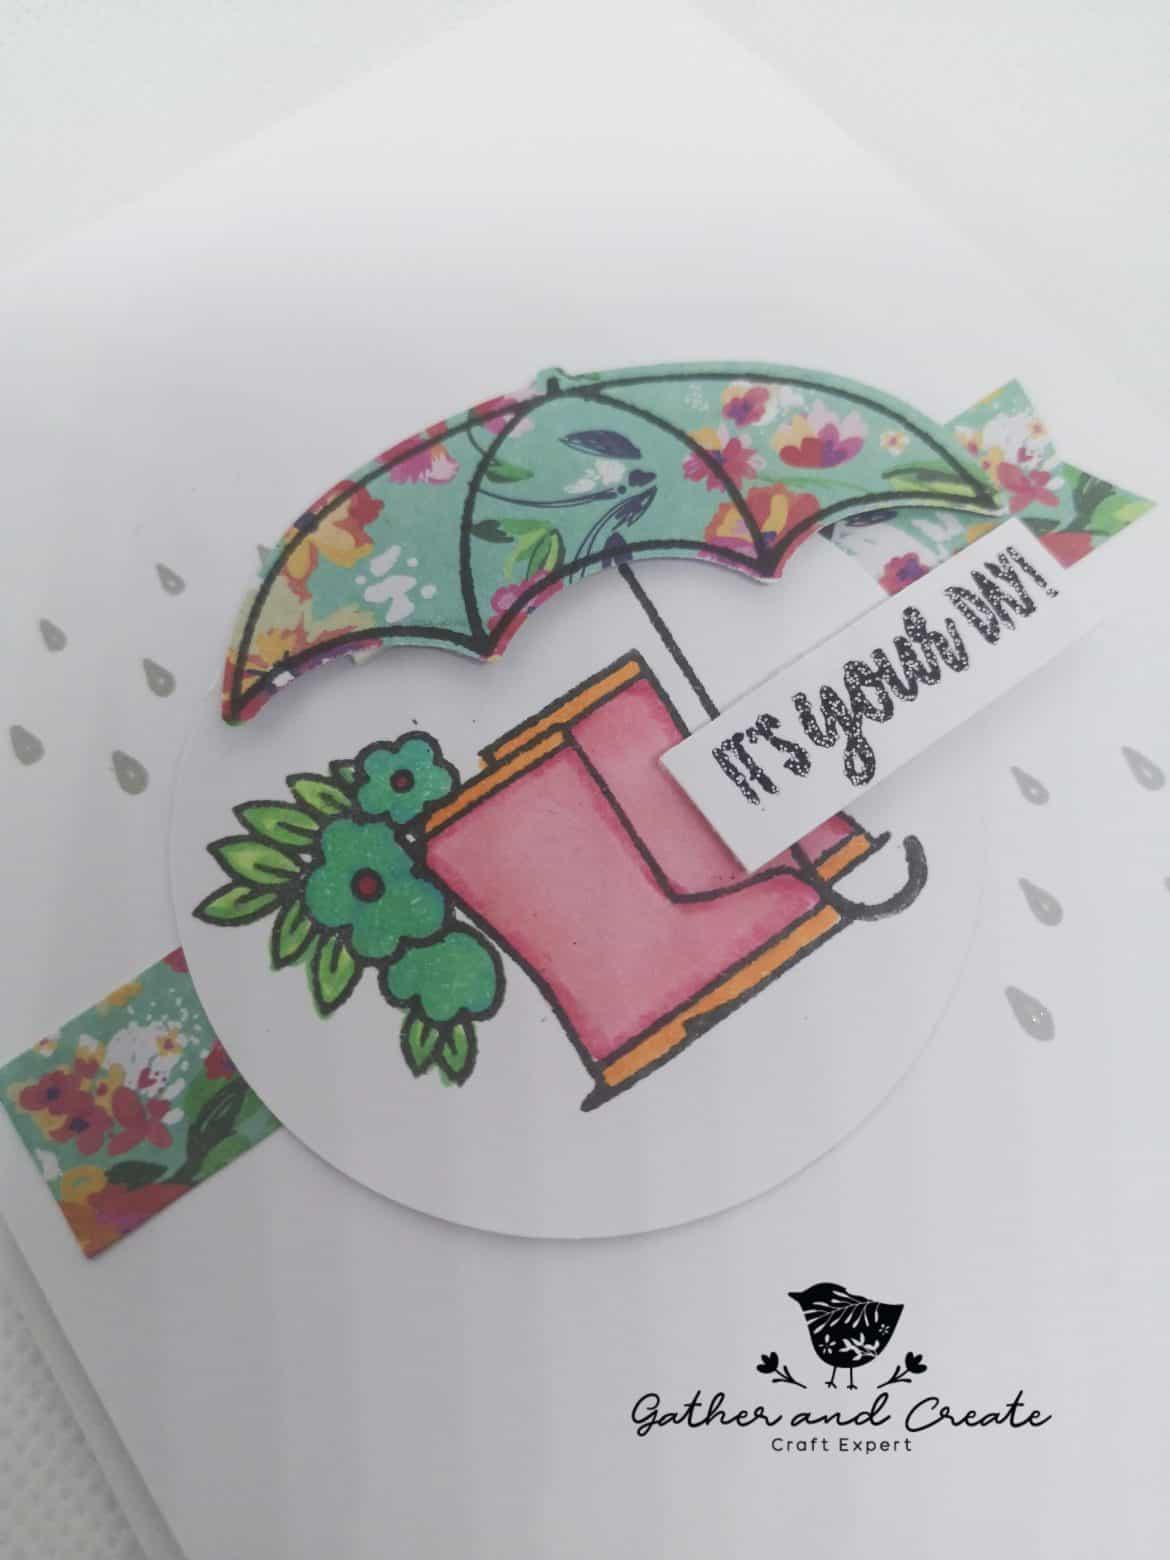 Stampin' Up! Under my umbrella bundle